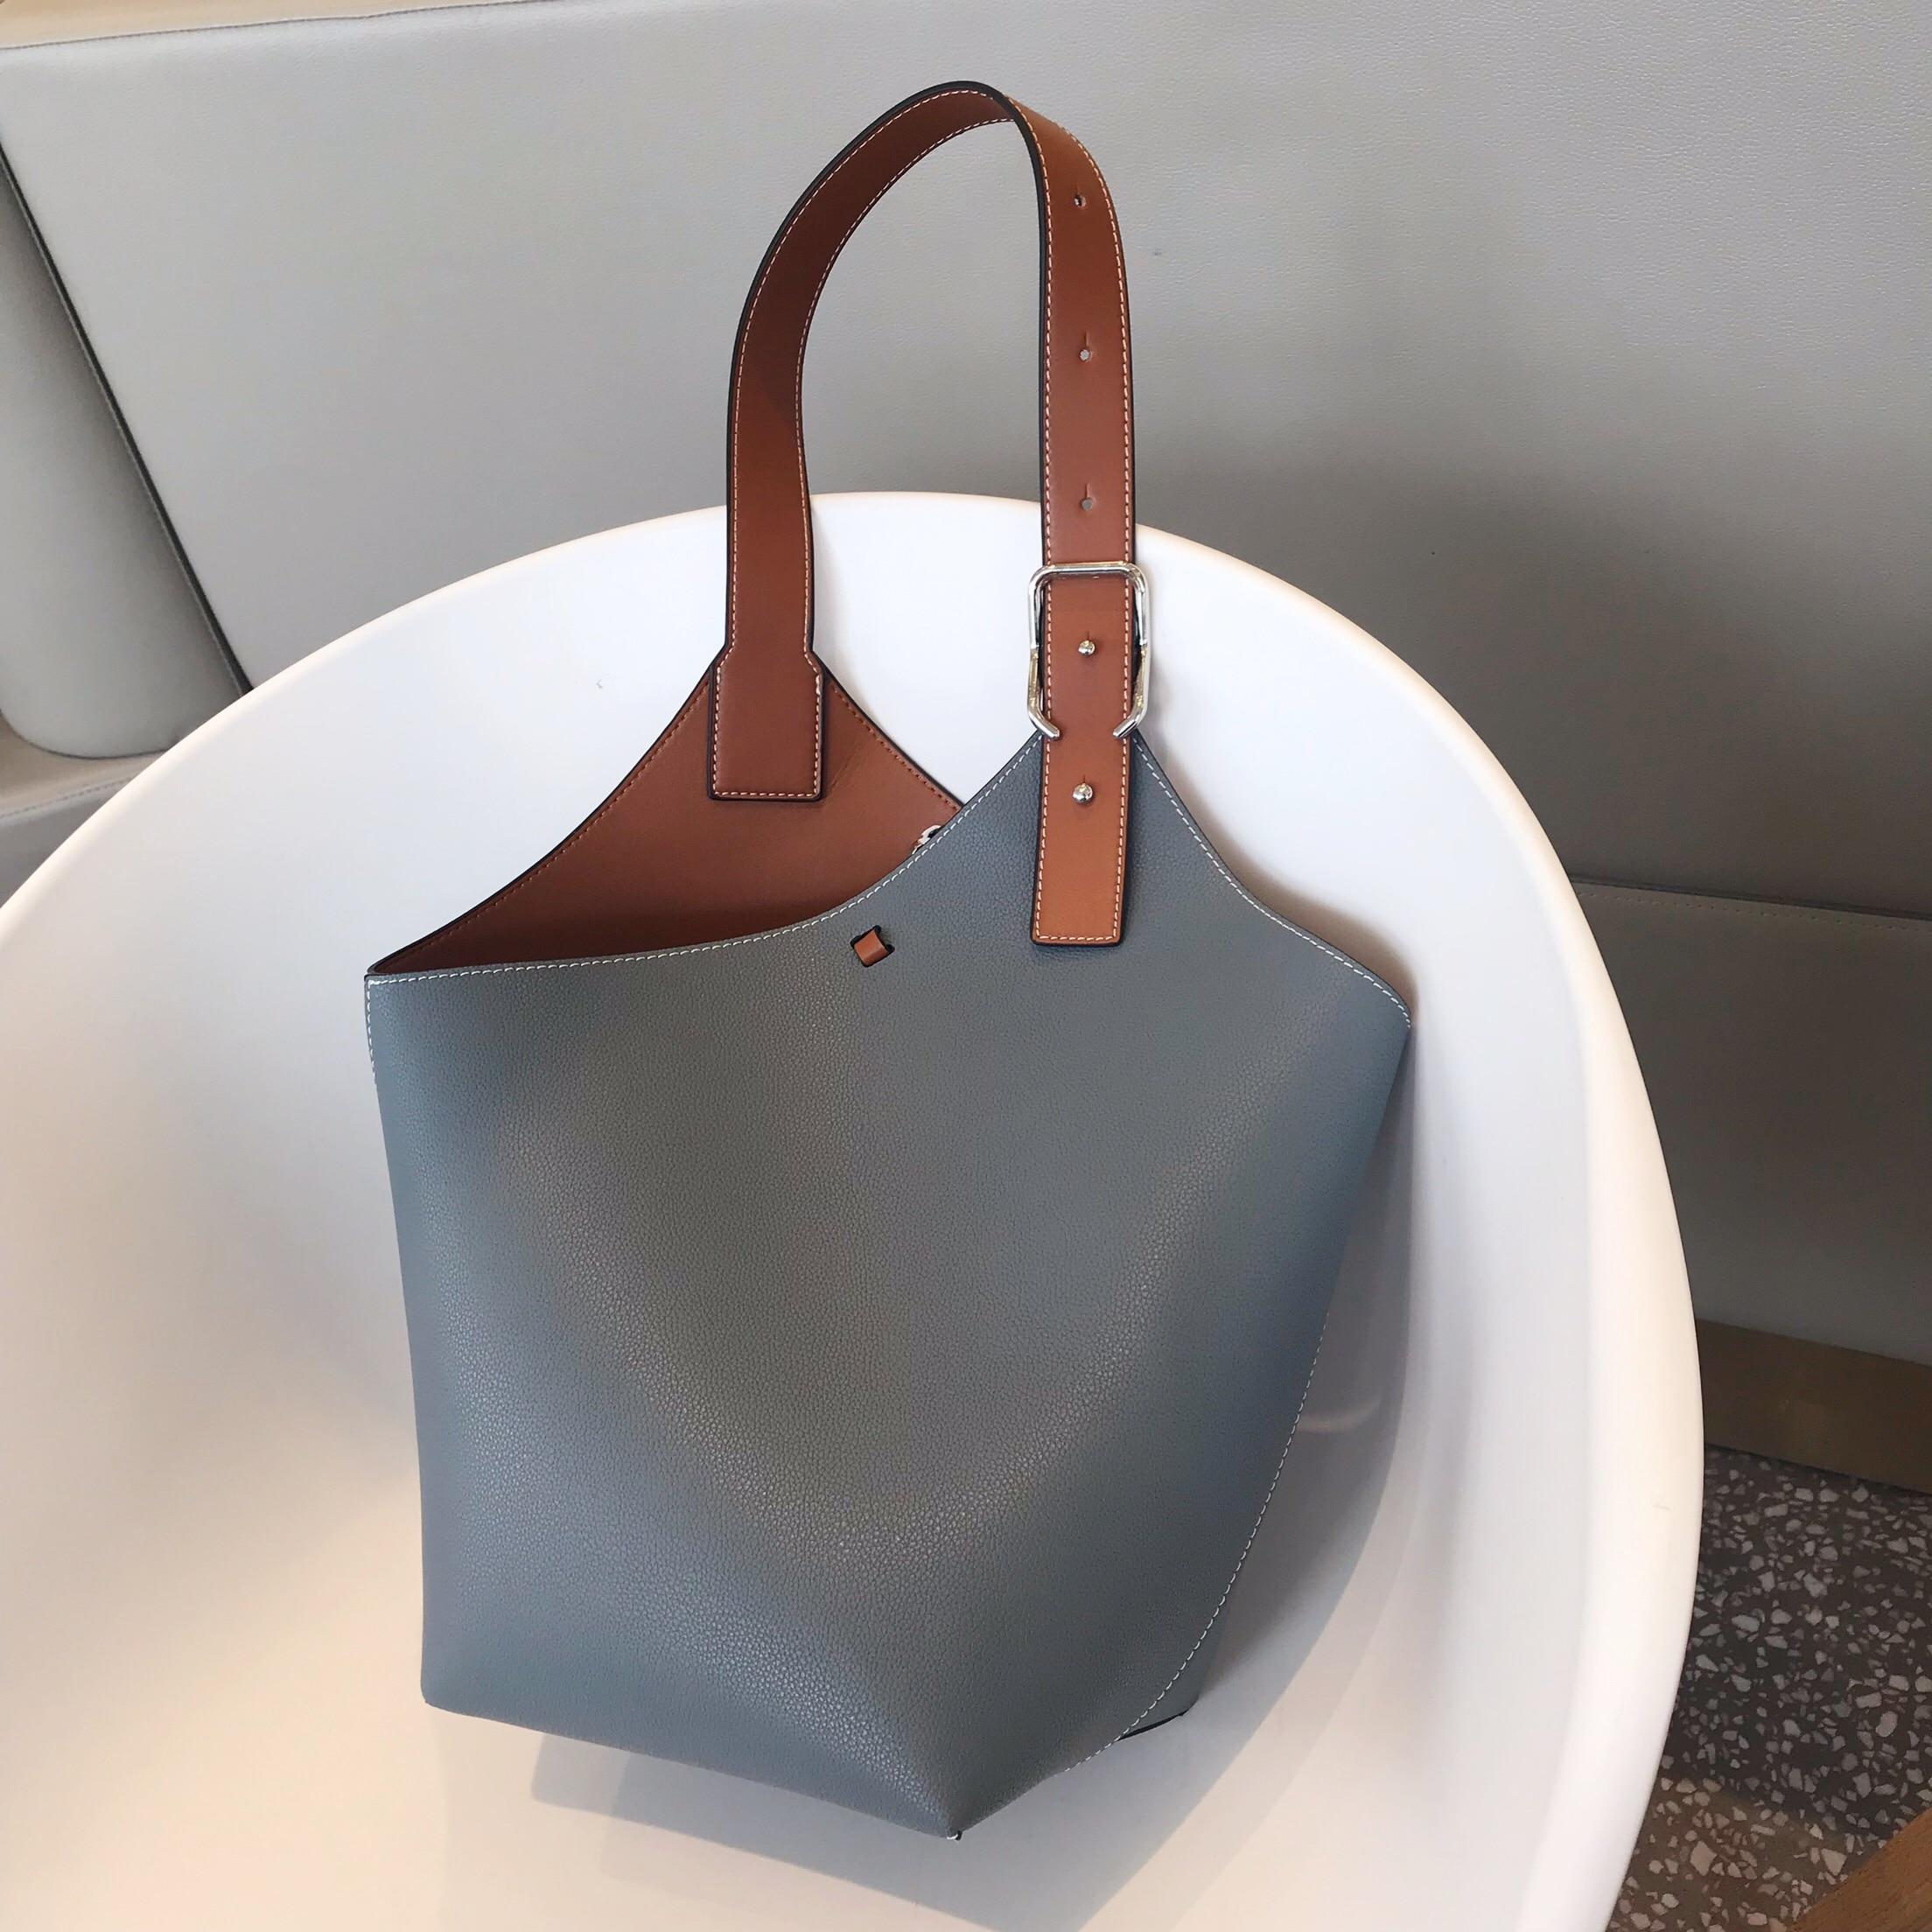 de designer de marca famosa sacola crossbody bolsa feminina